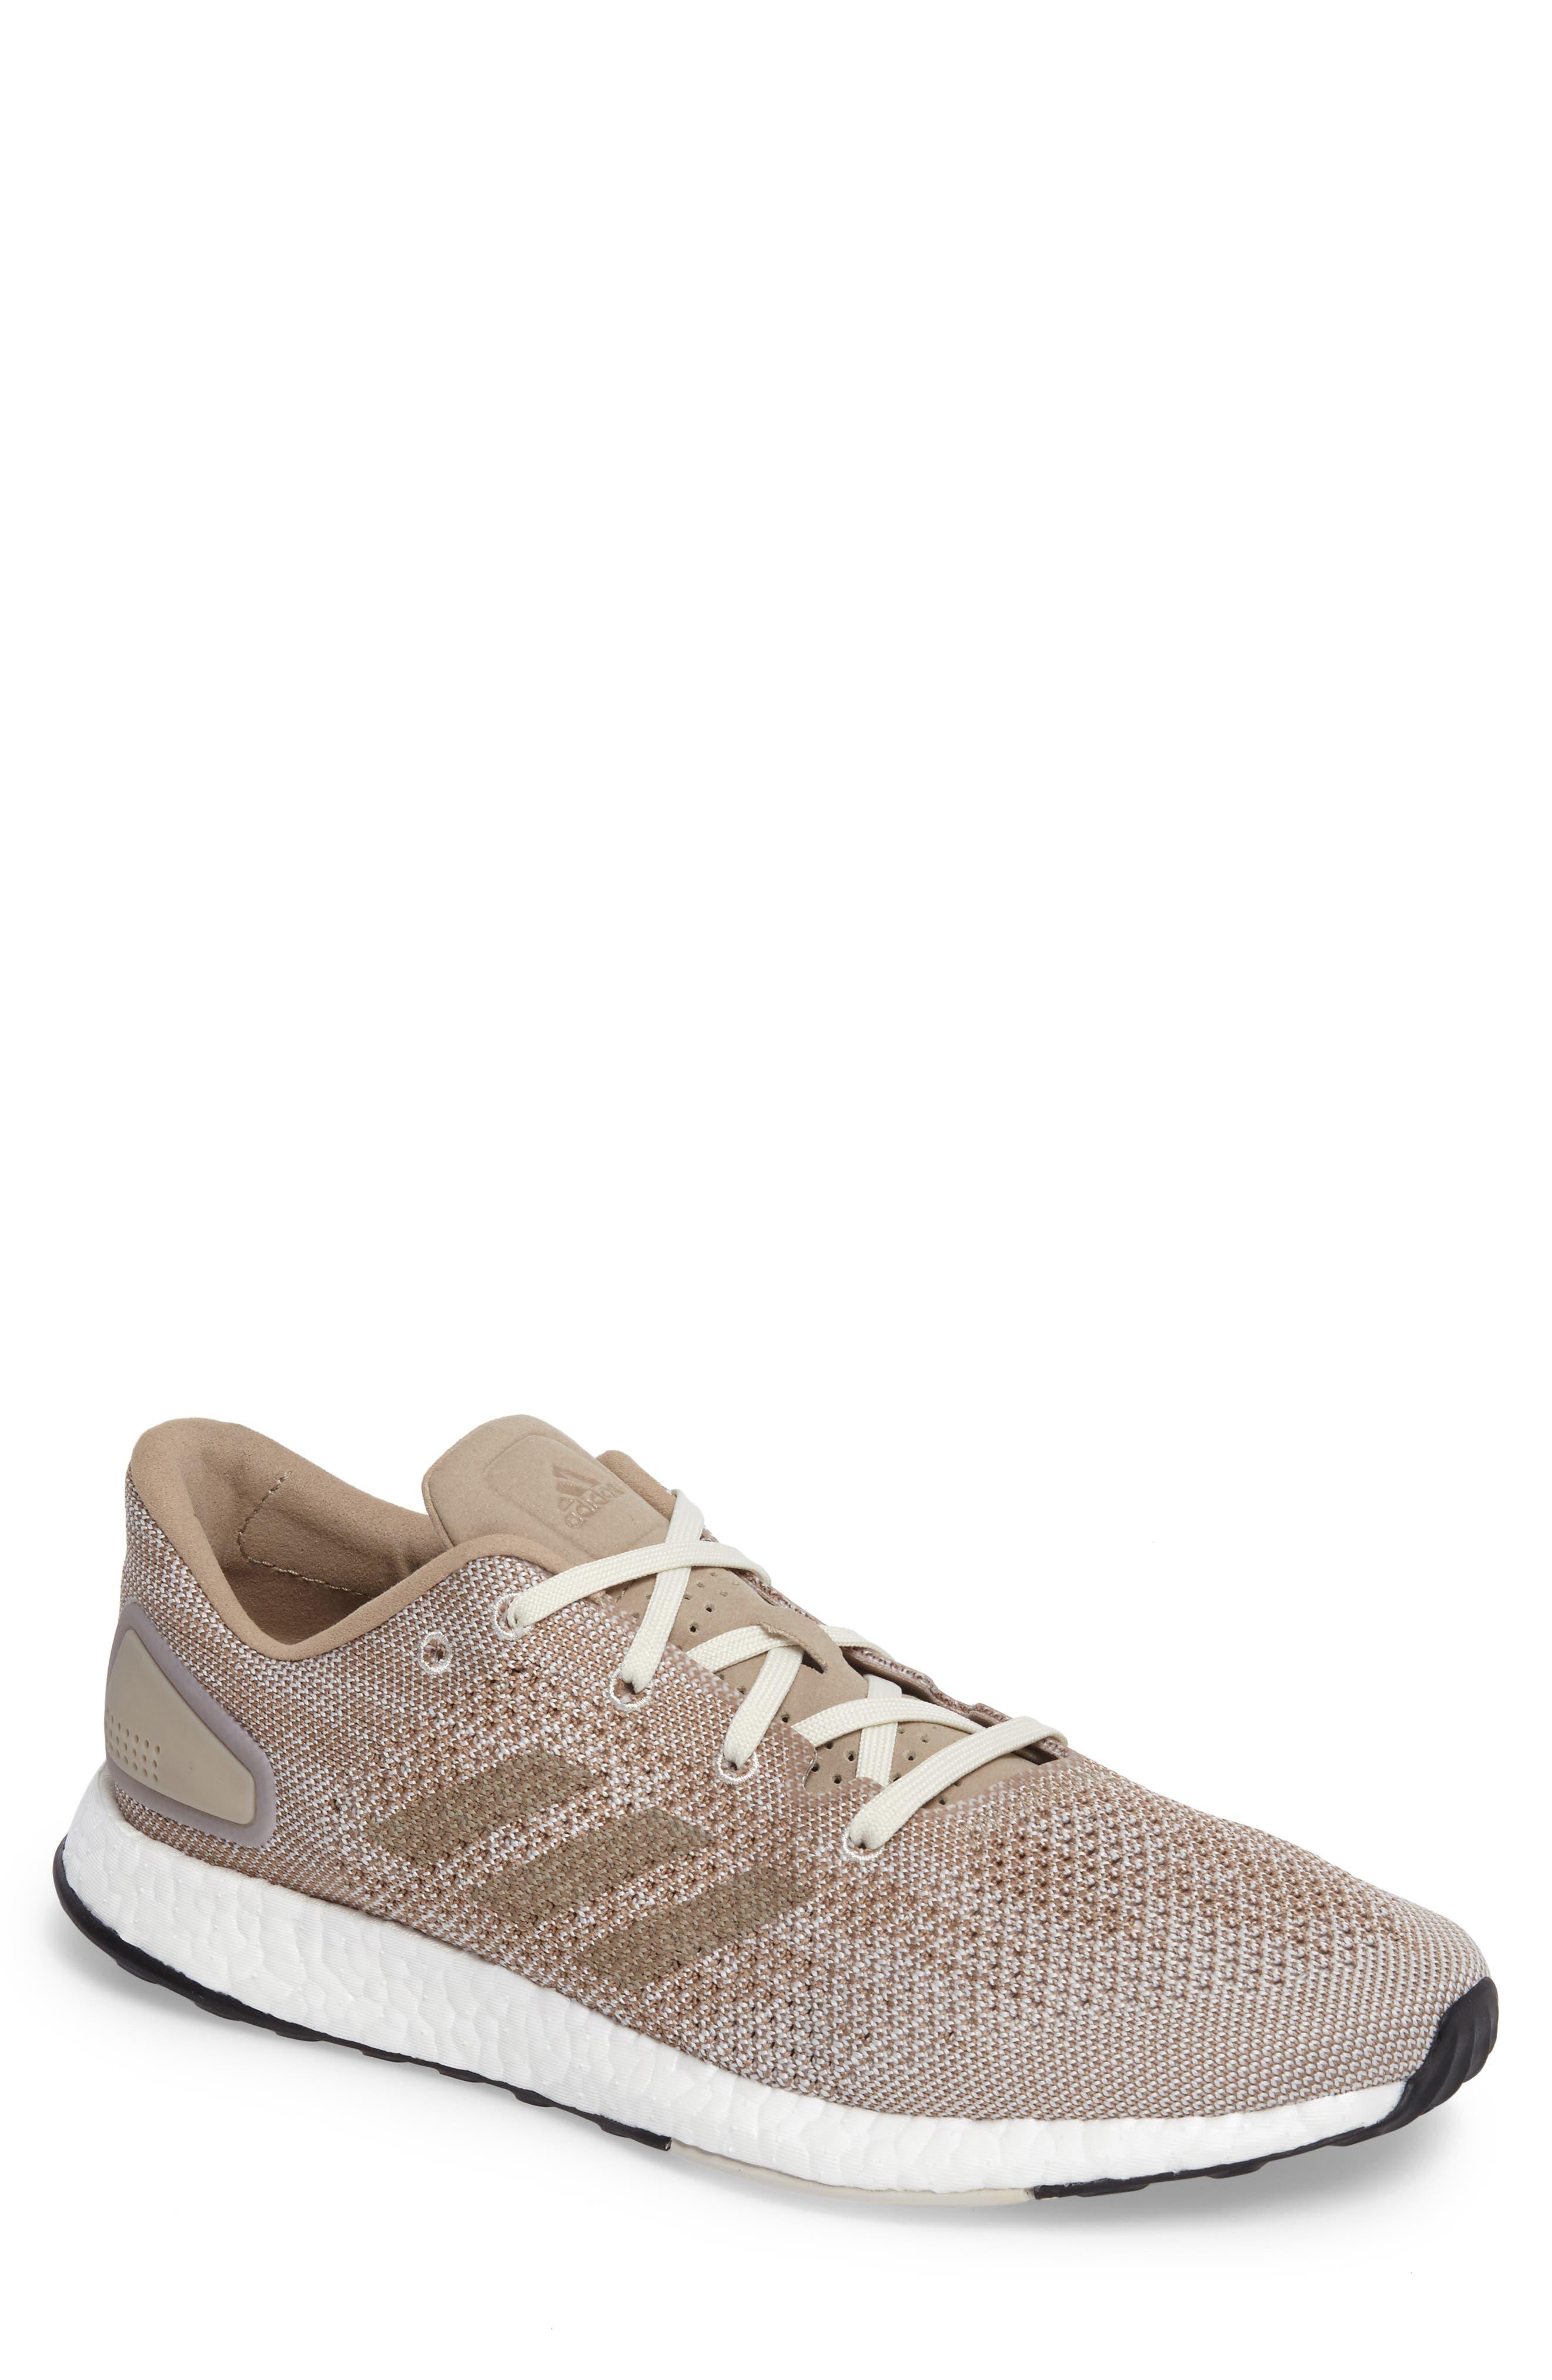 adidas Pureboost DPR Running Shoe (Men)